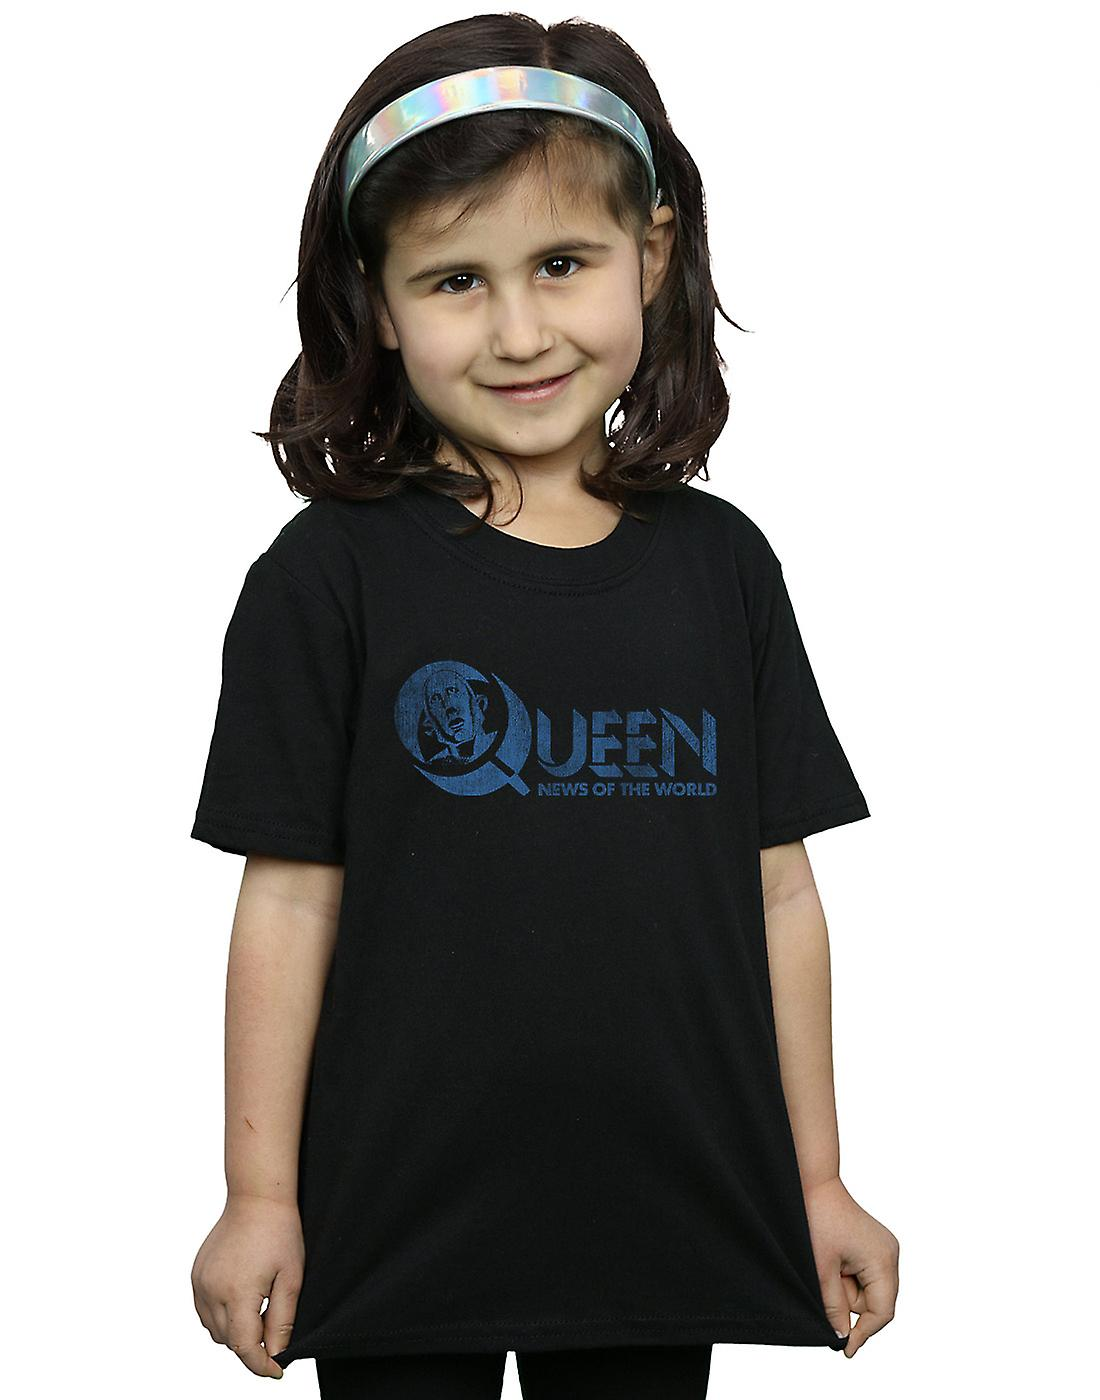 Queen Girls Distressed News Of The World T-Shirt